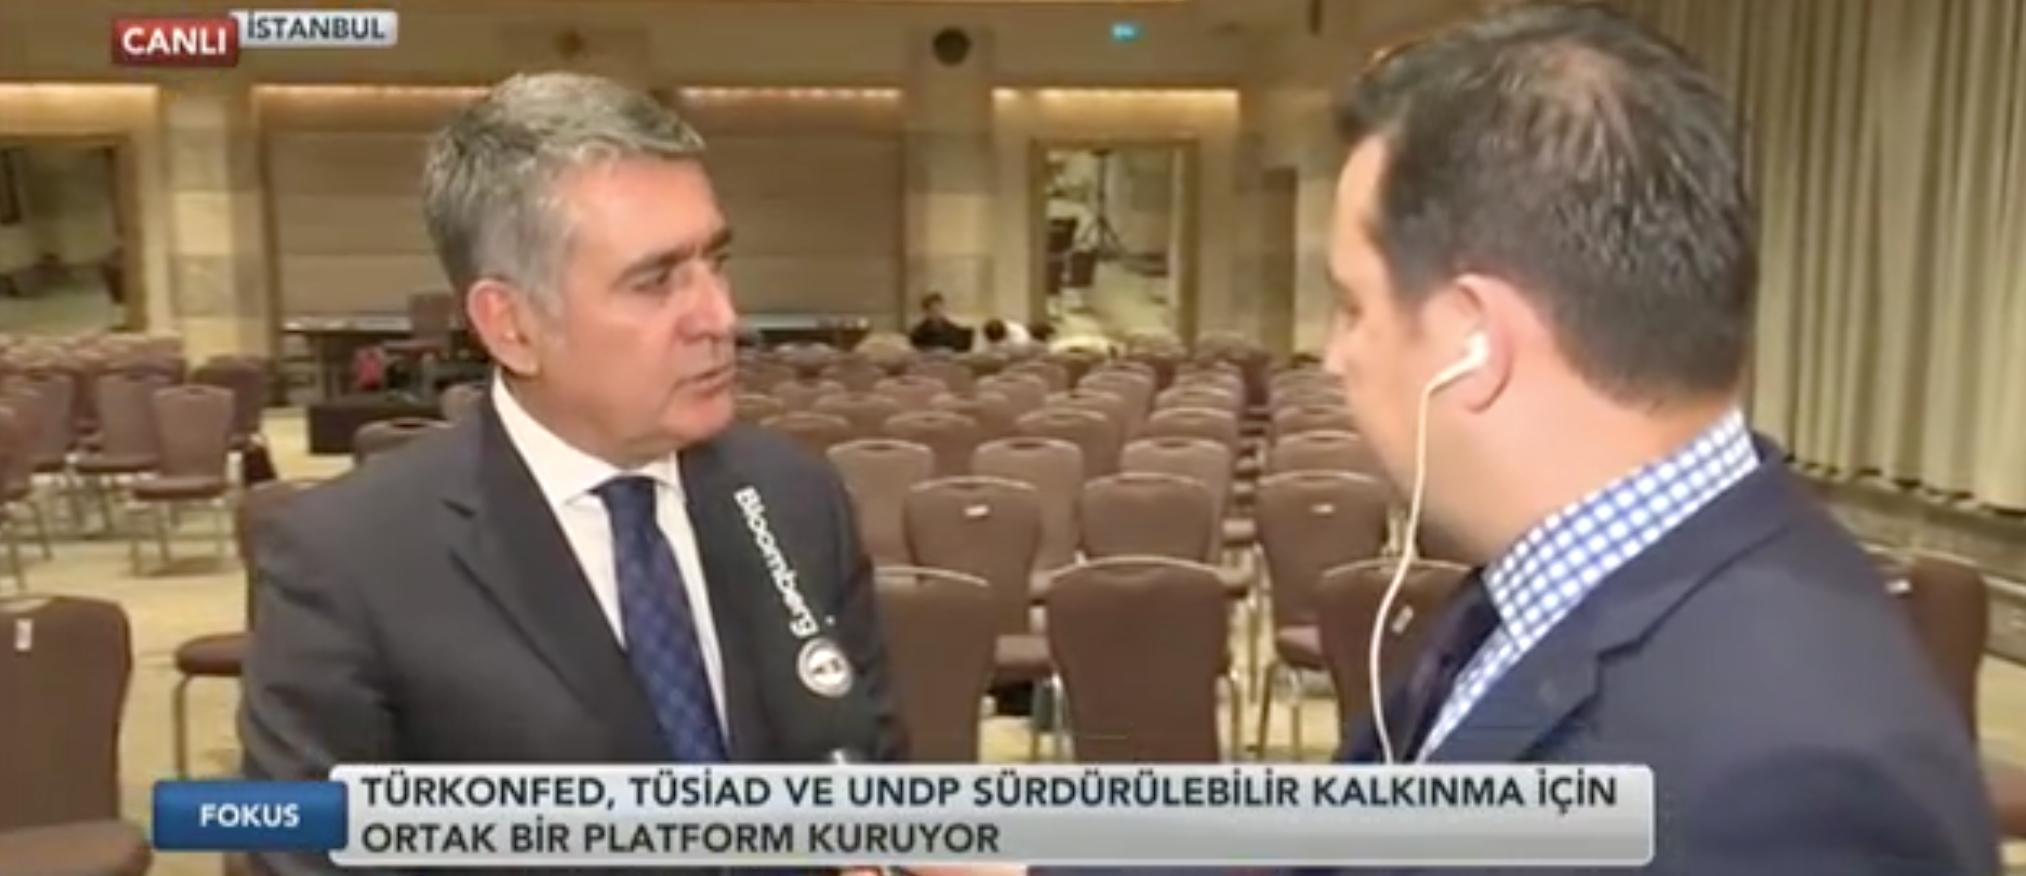 Orhan Turan 11 Ocak 2019 - Bloomberg HT